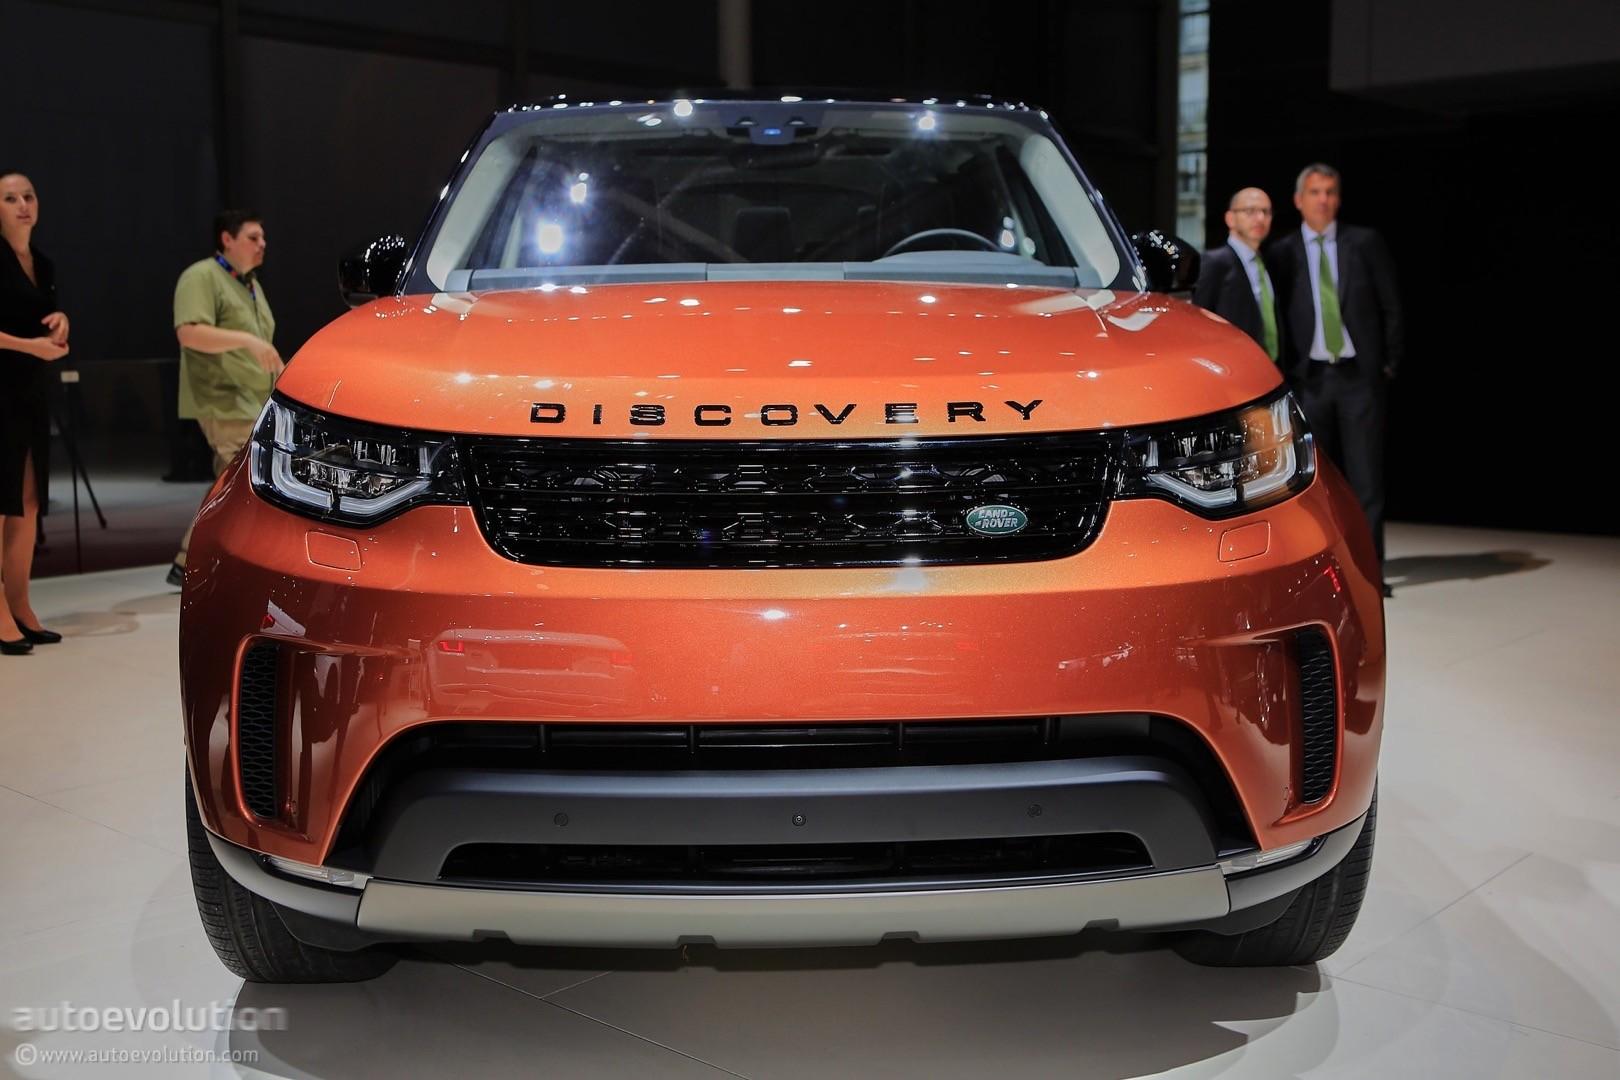 jaguar land rover opens slovakia plant amid brexit woes autoevolution. Black Bedroom Furniture Sets. Home Design Ideas